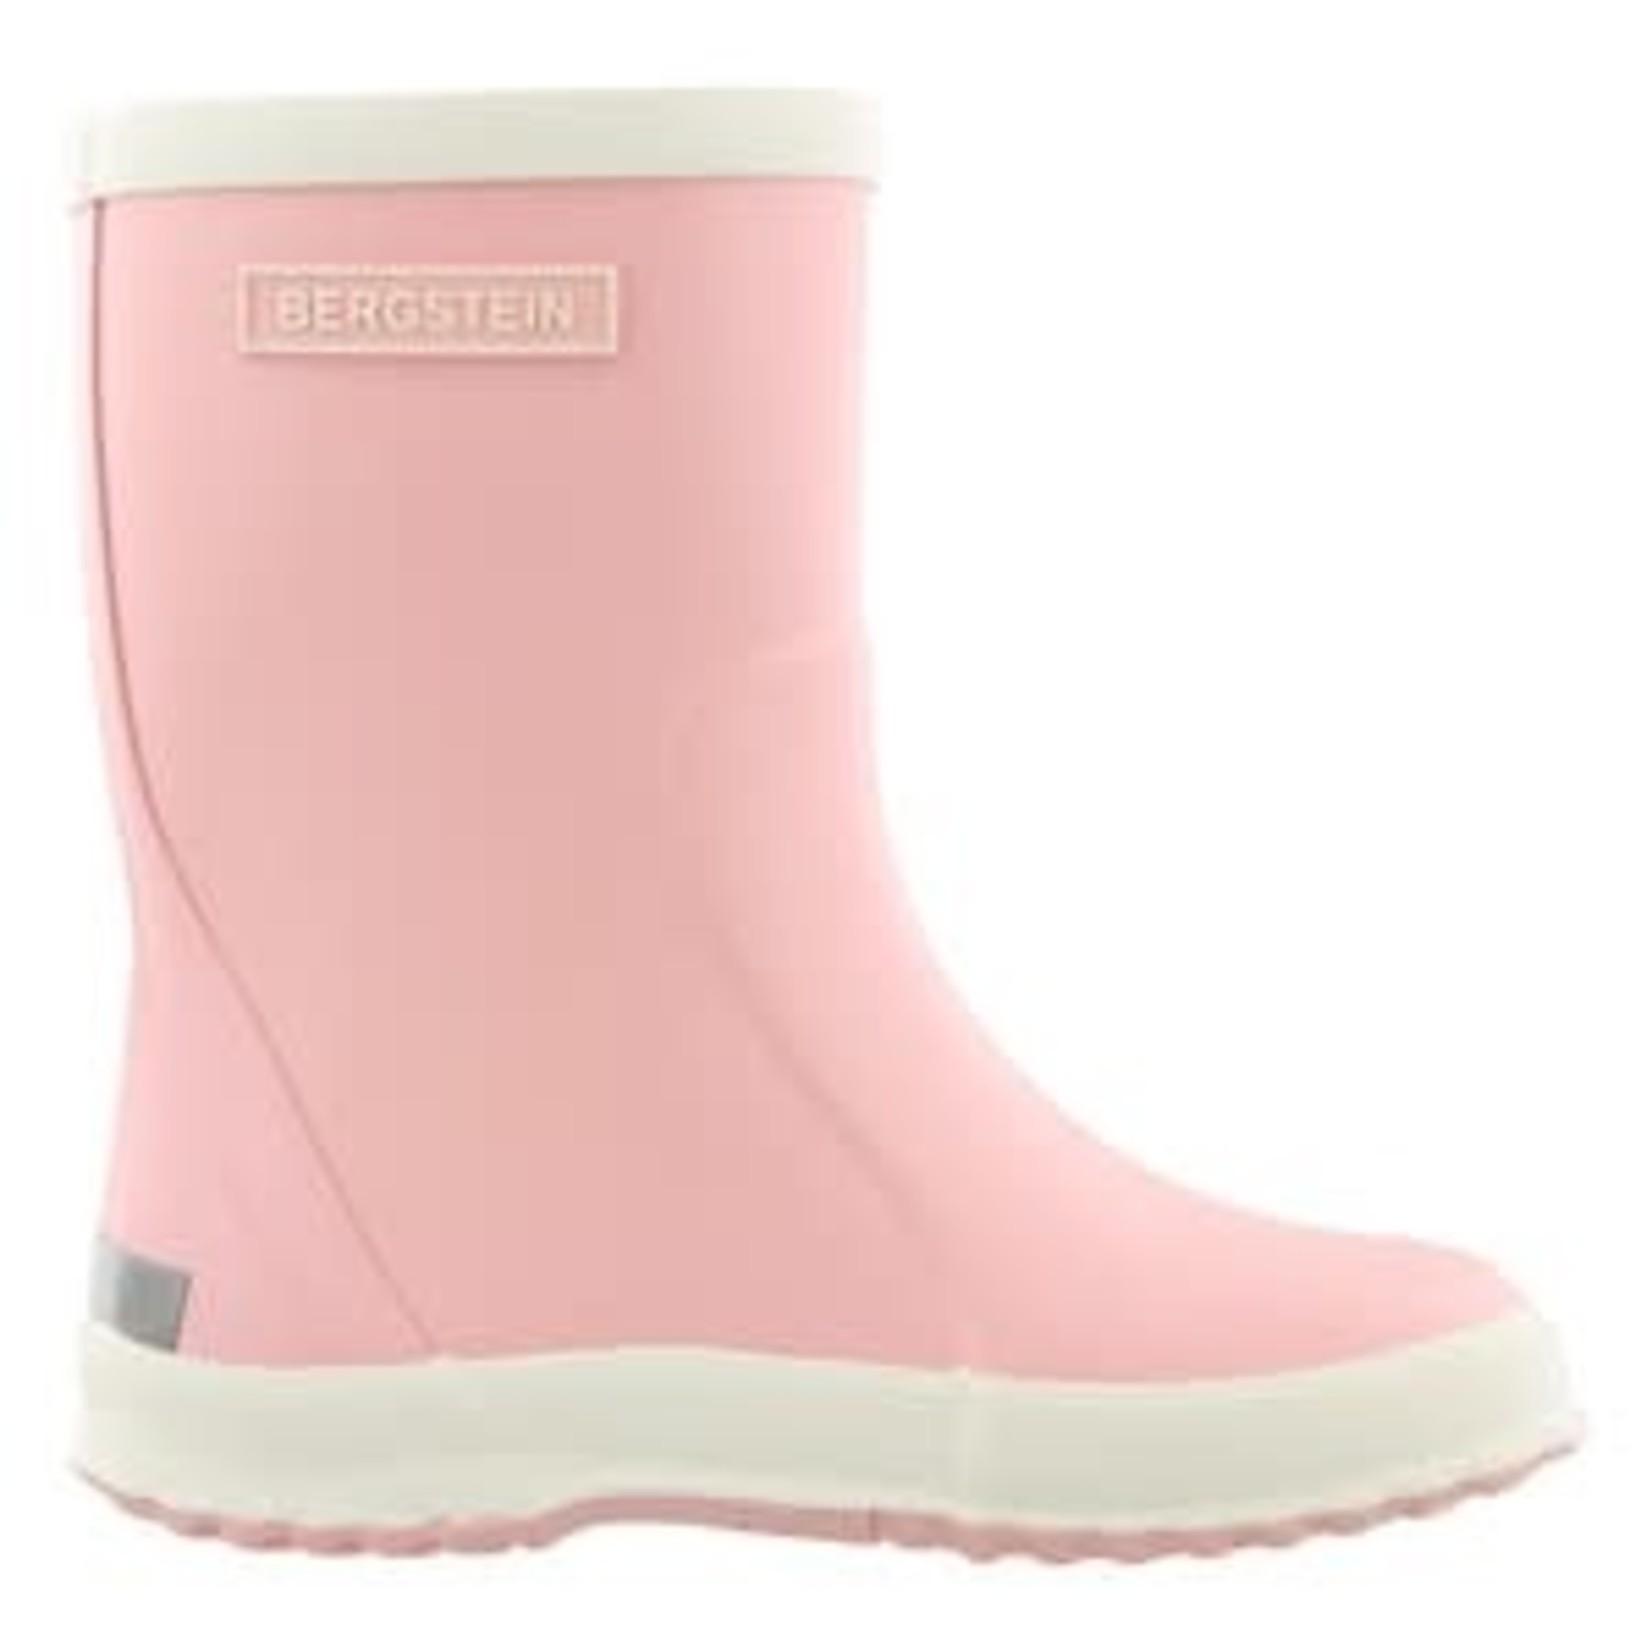 BERGSTEIN BERGSTEIN regenlaars soft-pink